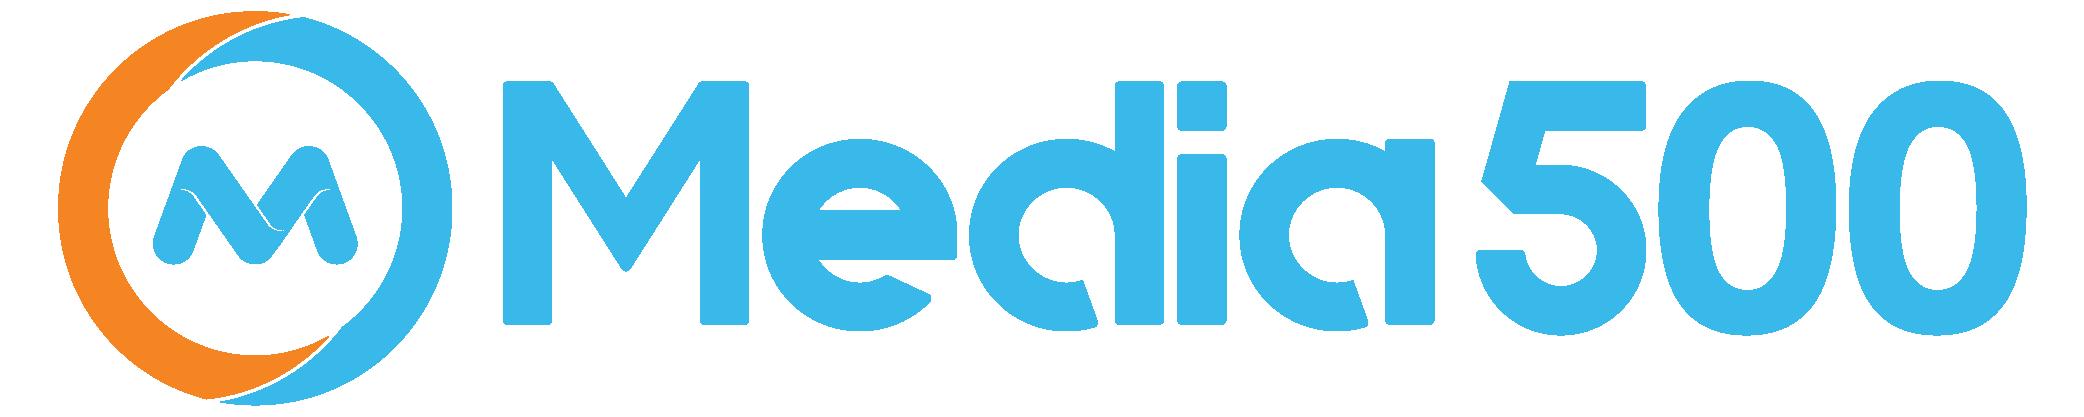 Media 500 Coupon Code